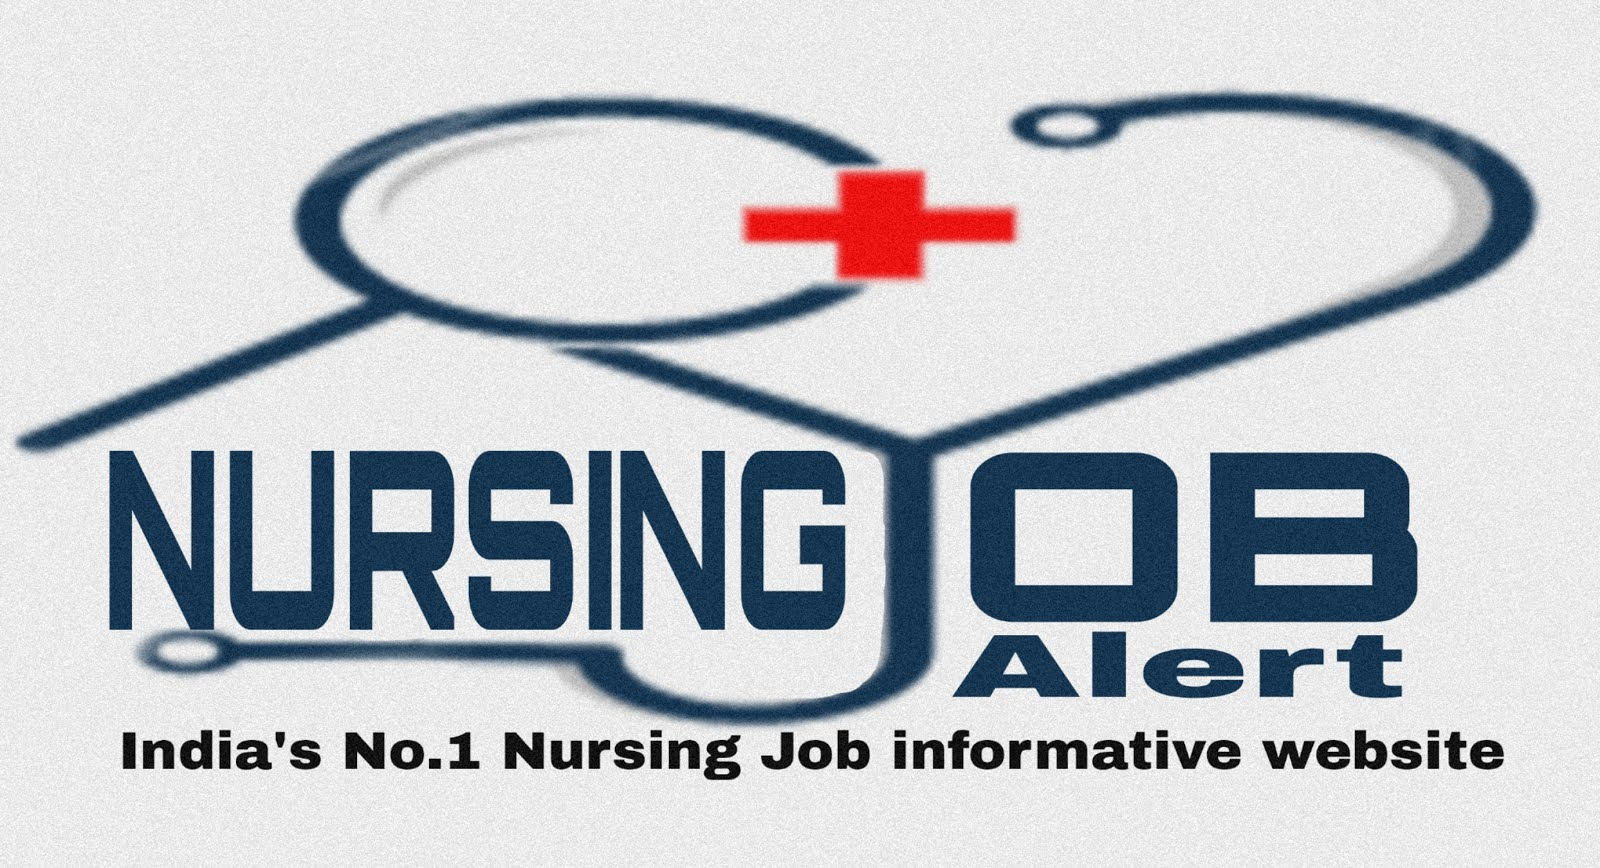 Nursing job alert